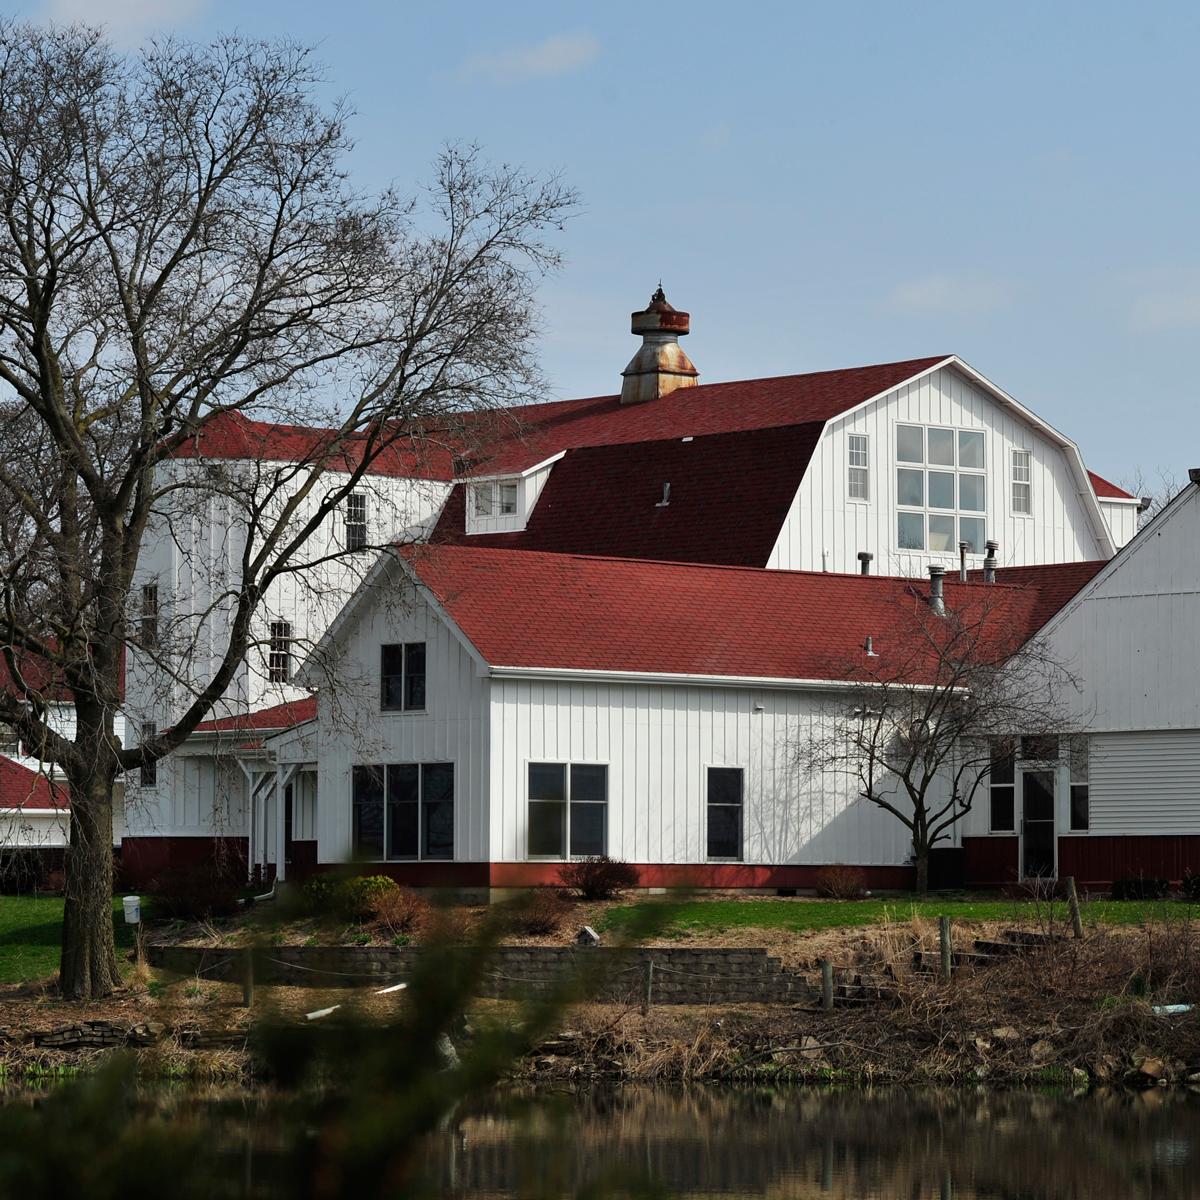 Banyan Treatment Centers - Heartland - Gilman, IL 60938 - (779)242-2468 | ShowMeLocal.com